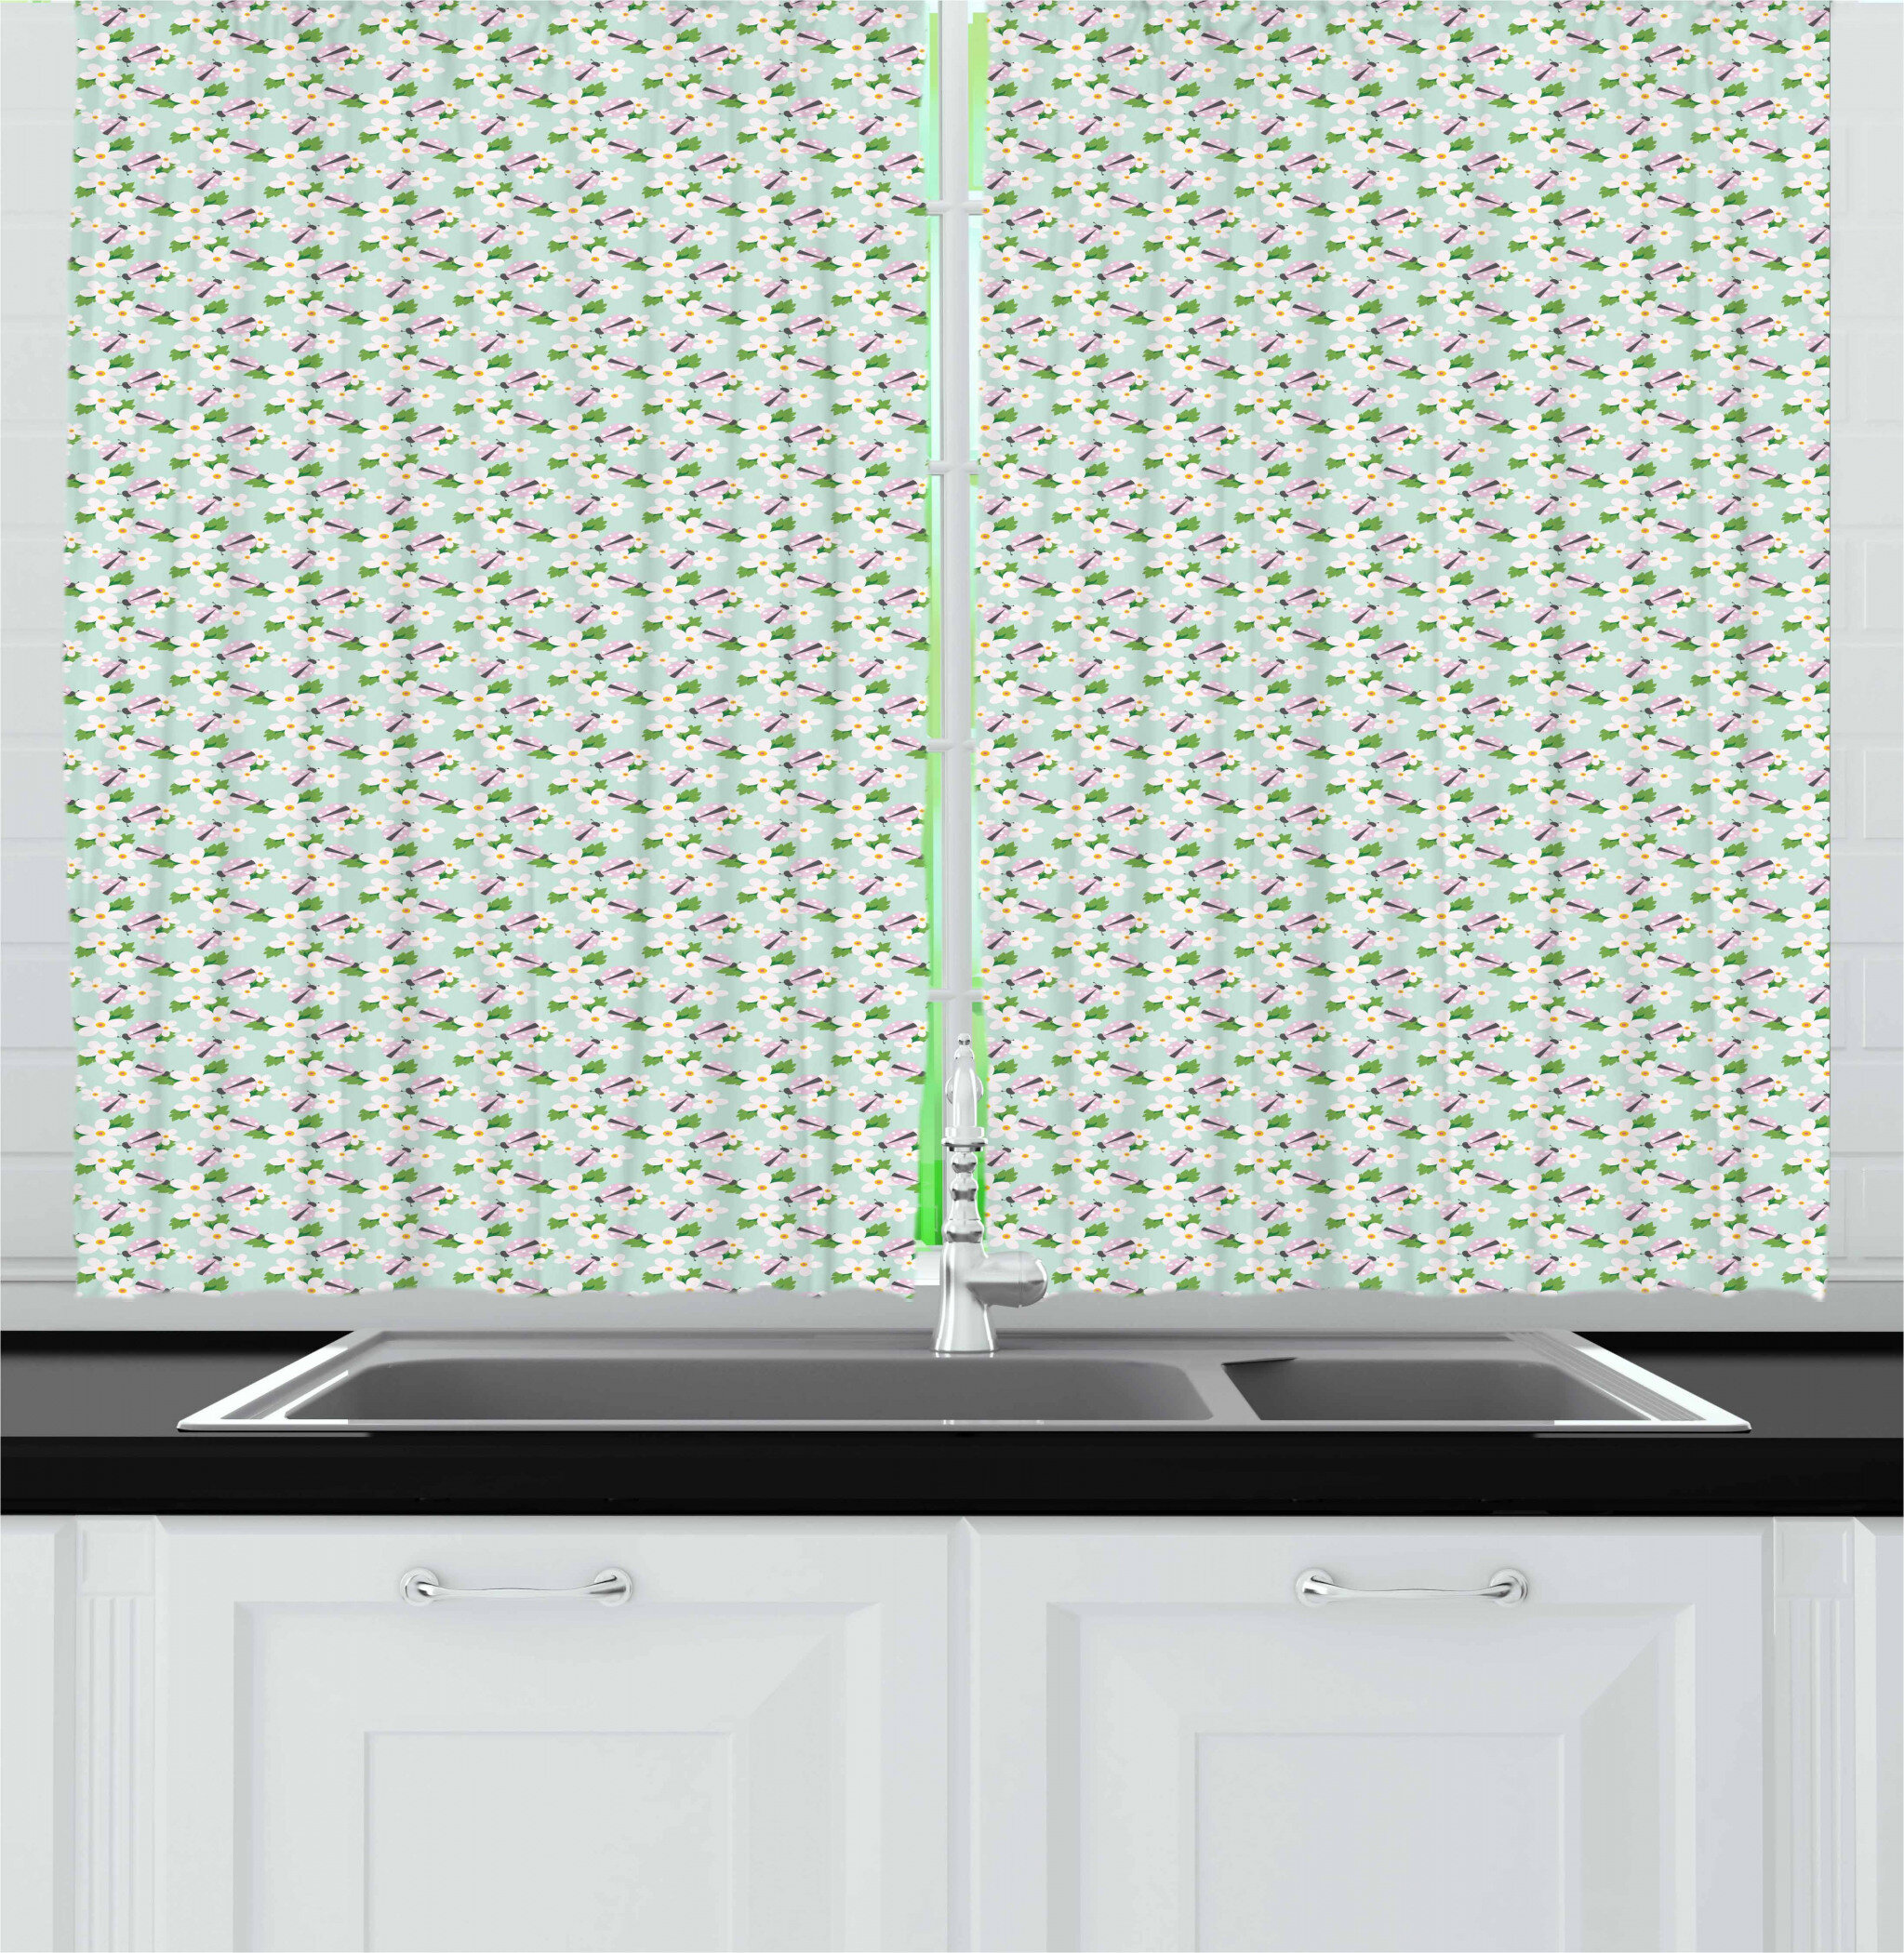 East Urban Home Ladybug Kitchen Curtain Wayfair